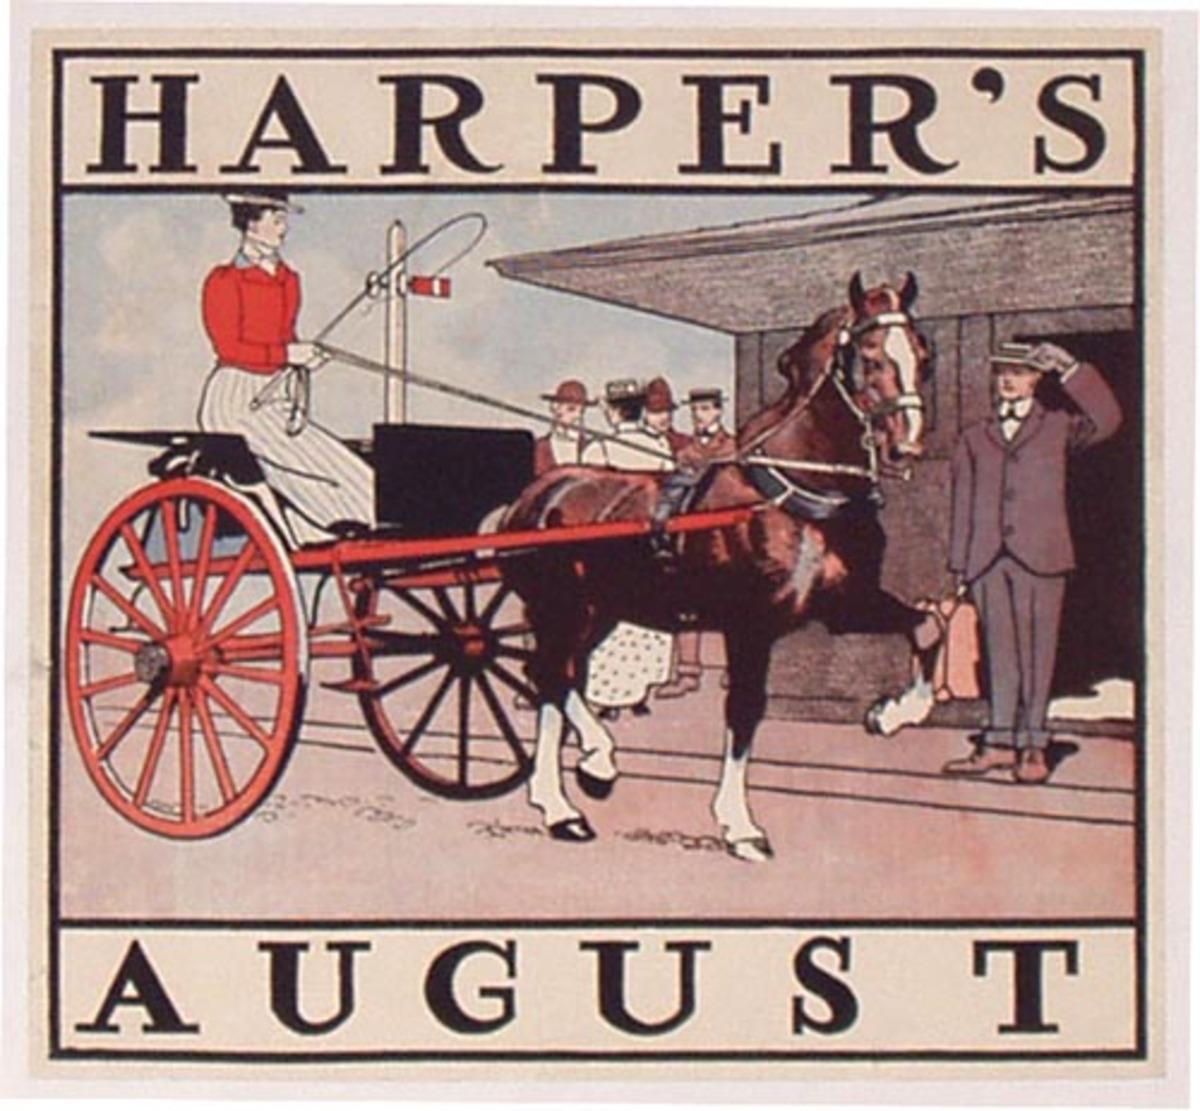 Harper's Magazine August 1899 Railroad Station Original Vintage Literary Poster